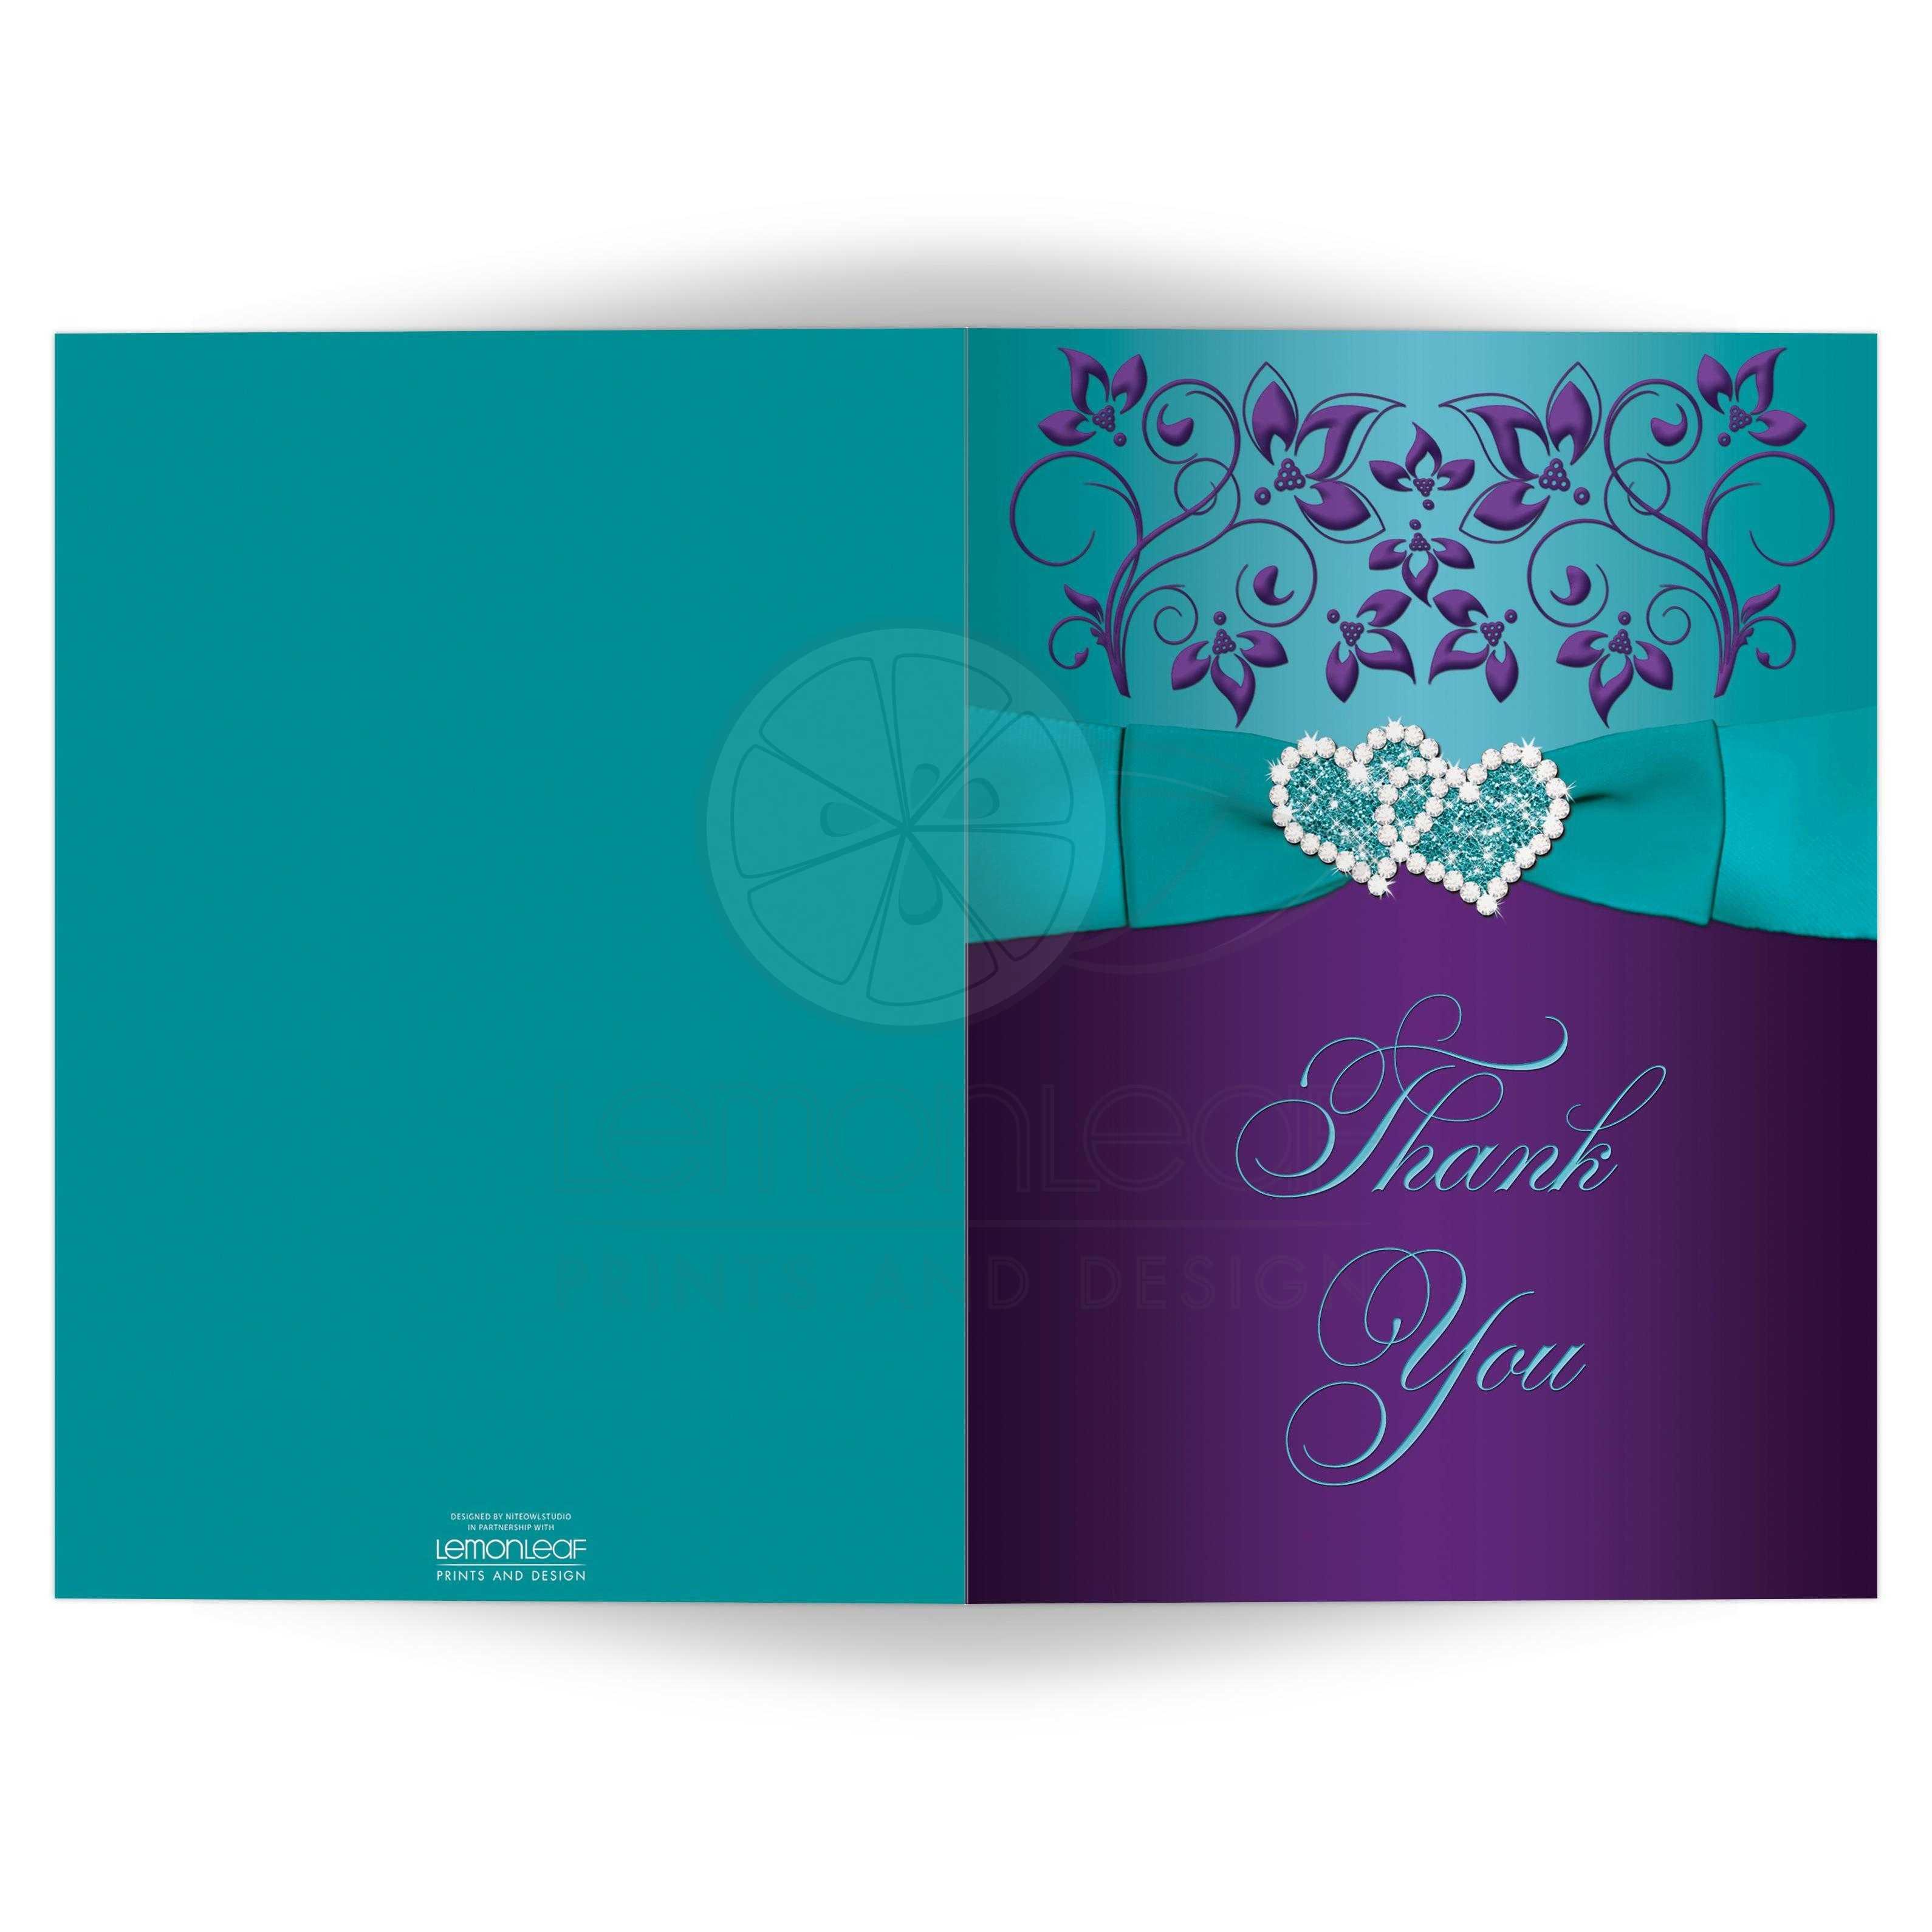 wedding photo thank you cards